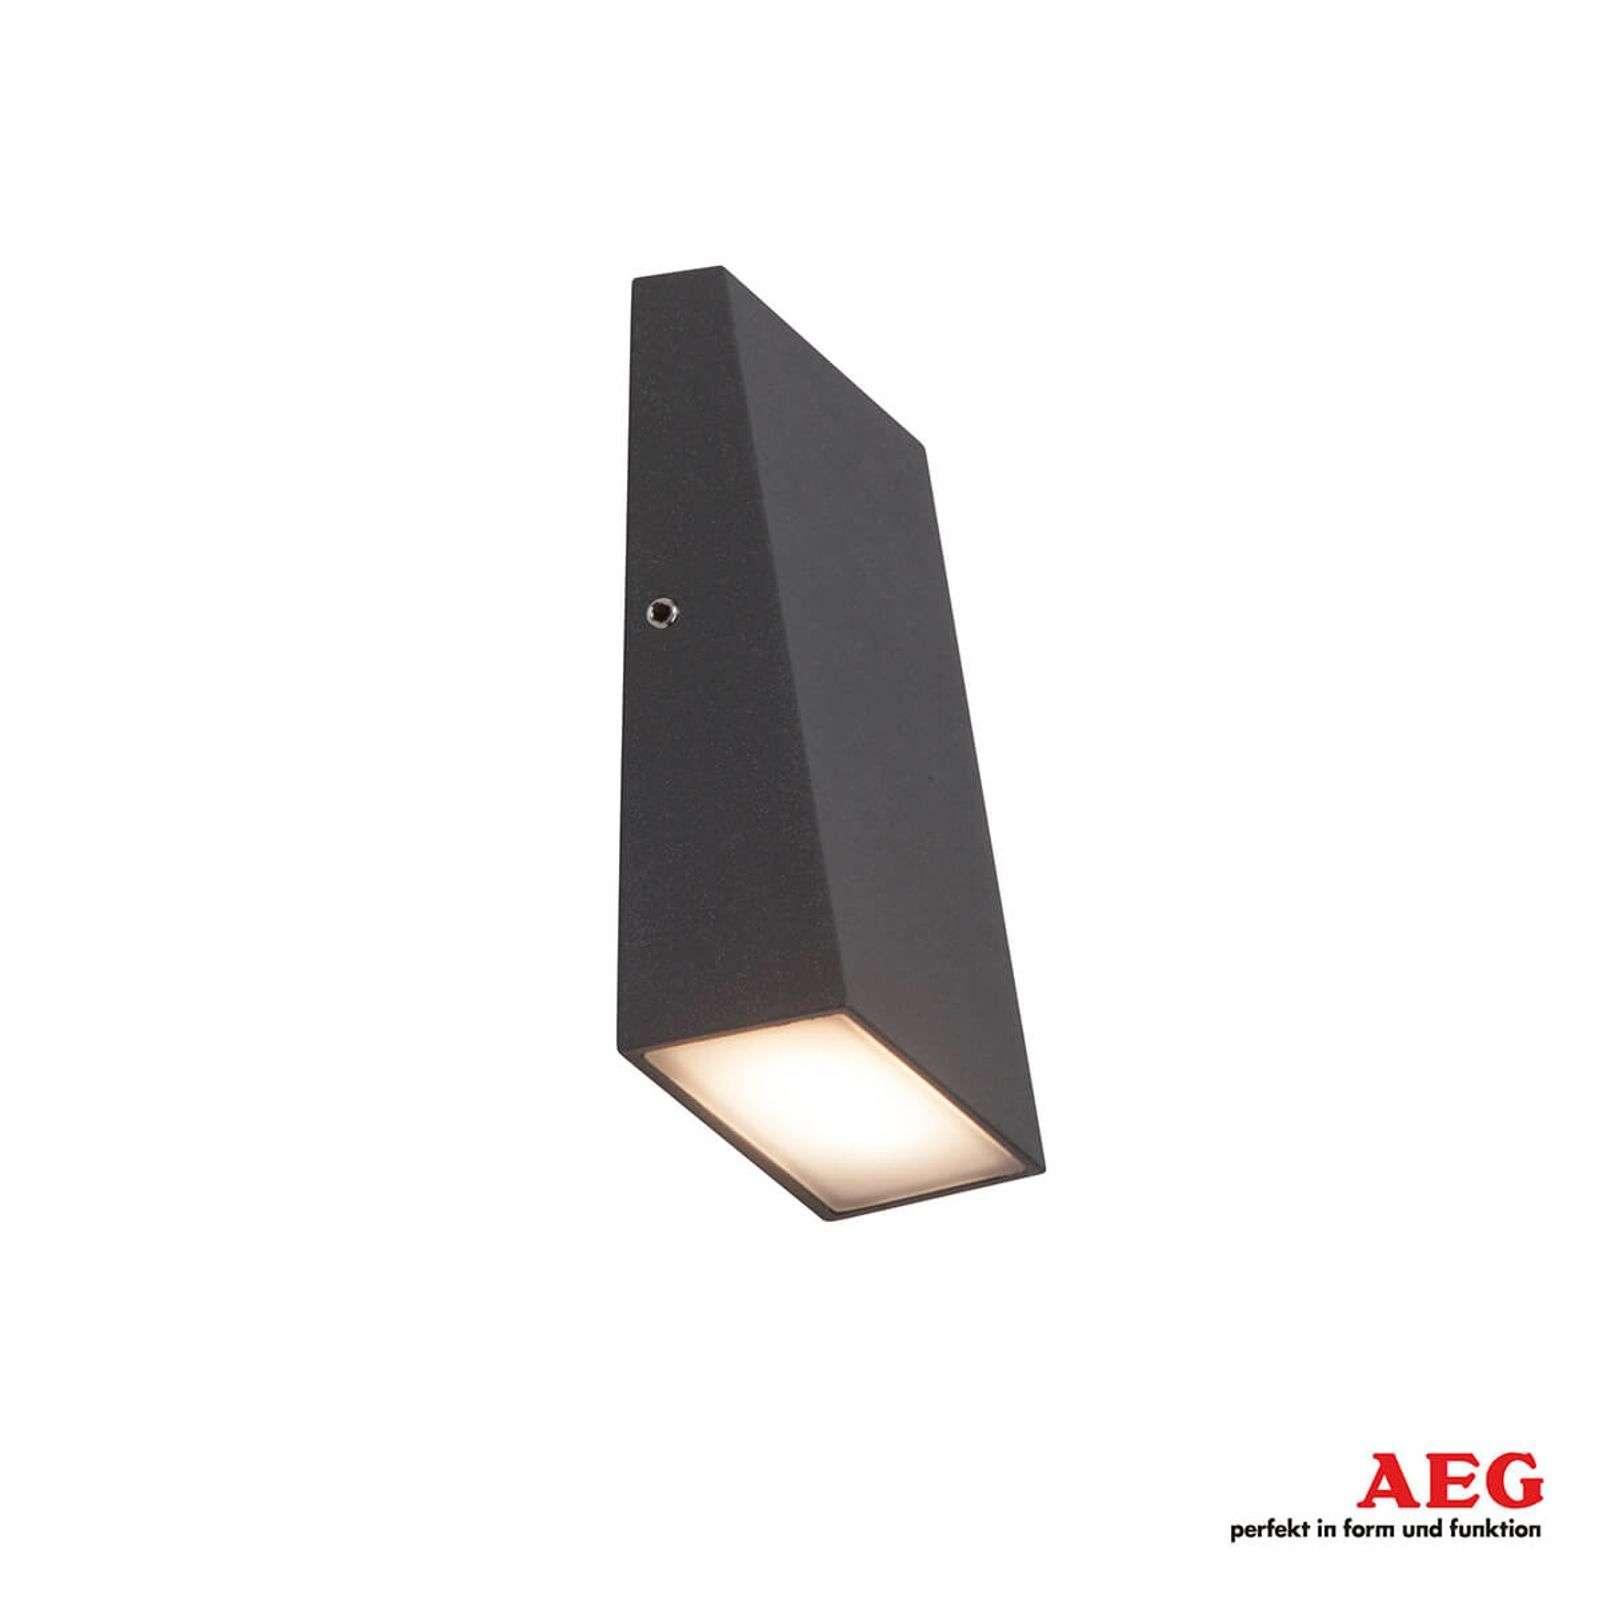 AEG Applique da esterni LED Tivana autopulente